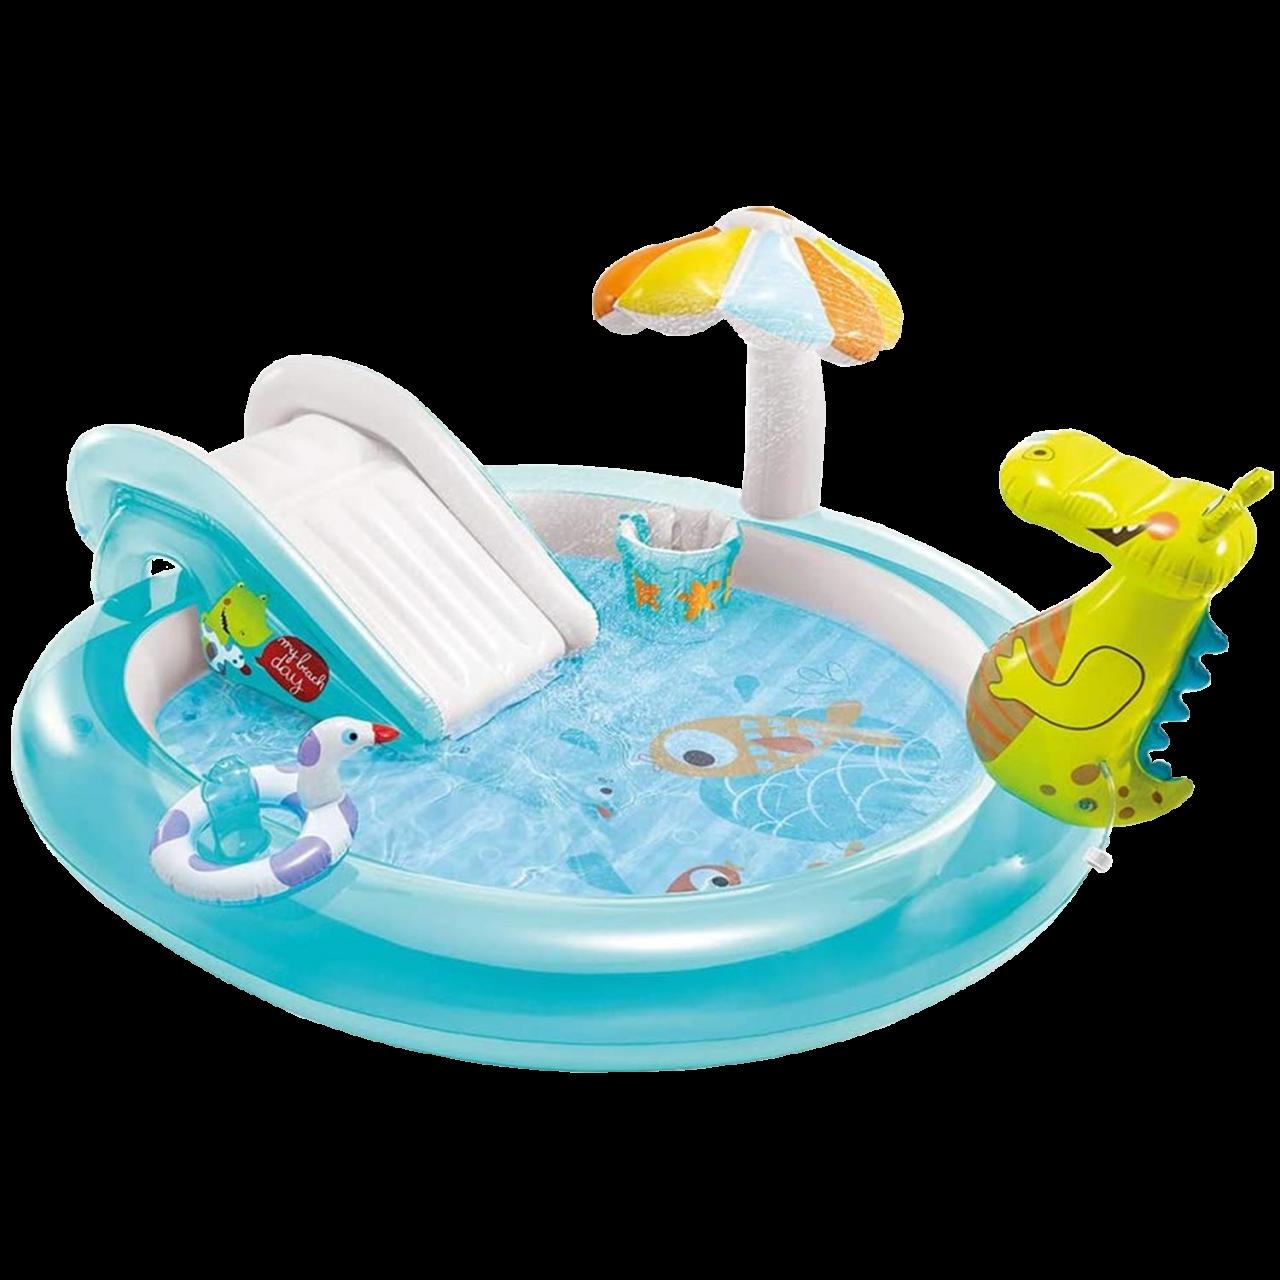 Intex Play Center Aufblasbarer Kinderpool Gator Schwimmbad 201x170x84 cm 57165